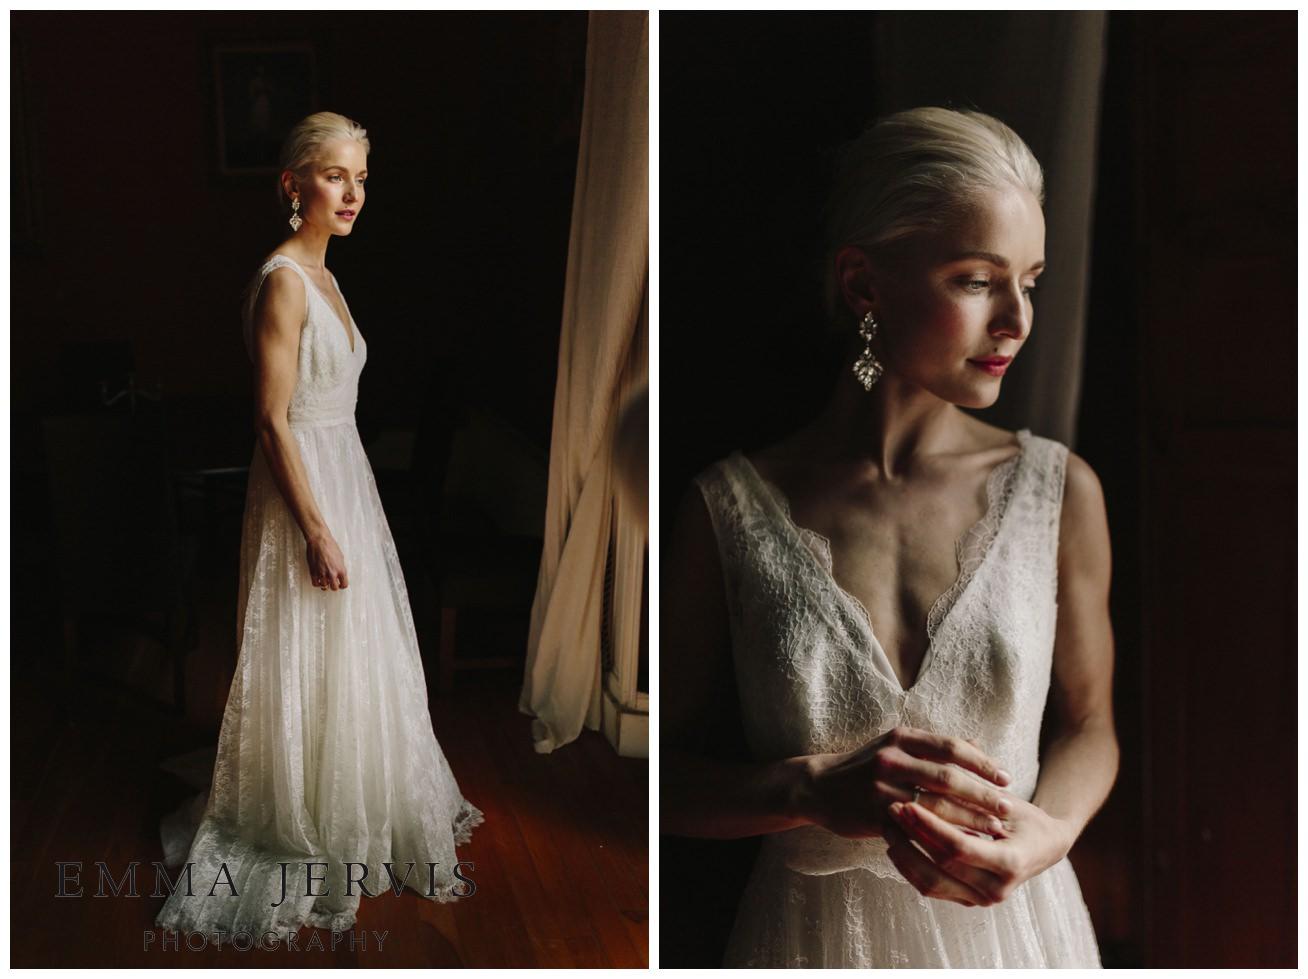 Wedding workshop 2017, emma jervis photography, tomasz Kornas, paula o'hara, epic love photography, De Burgh Manor, Ireland, Wedding photography,